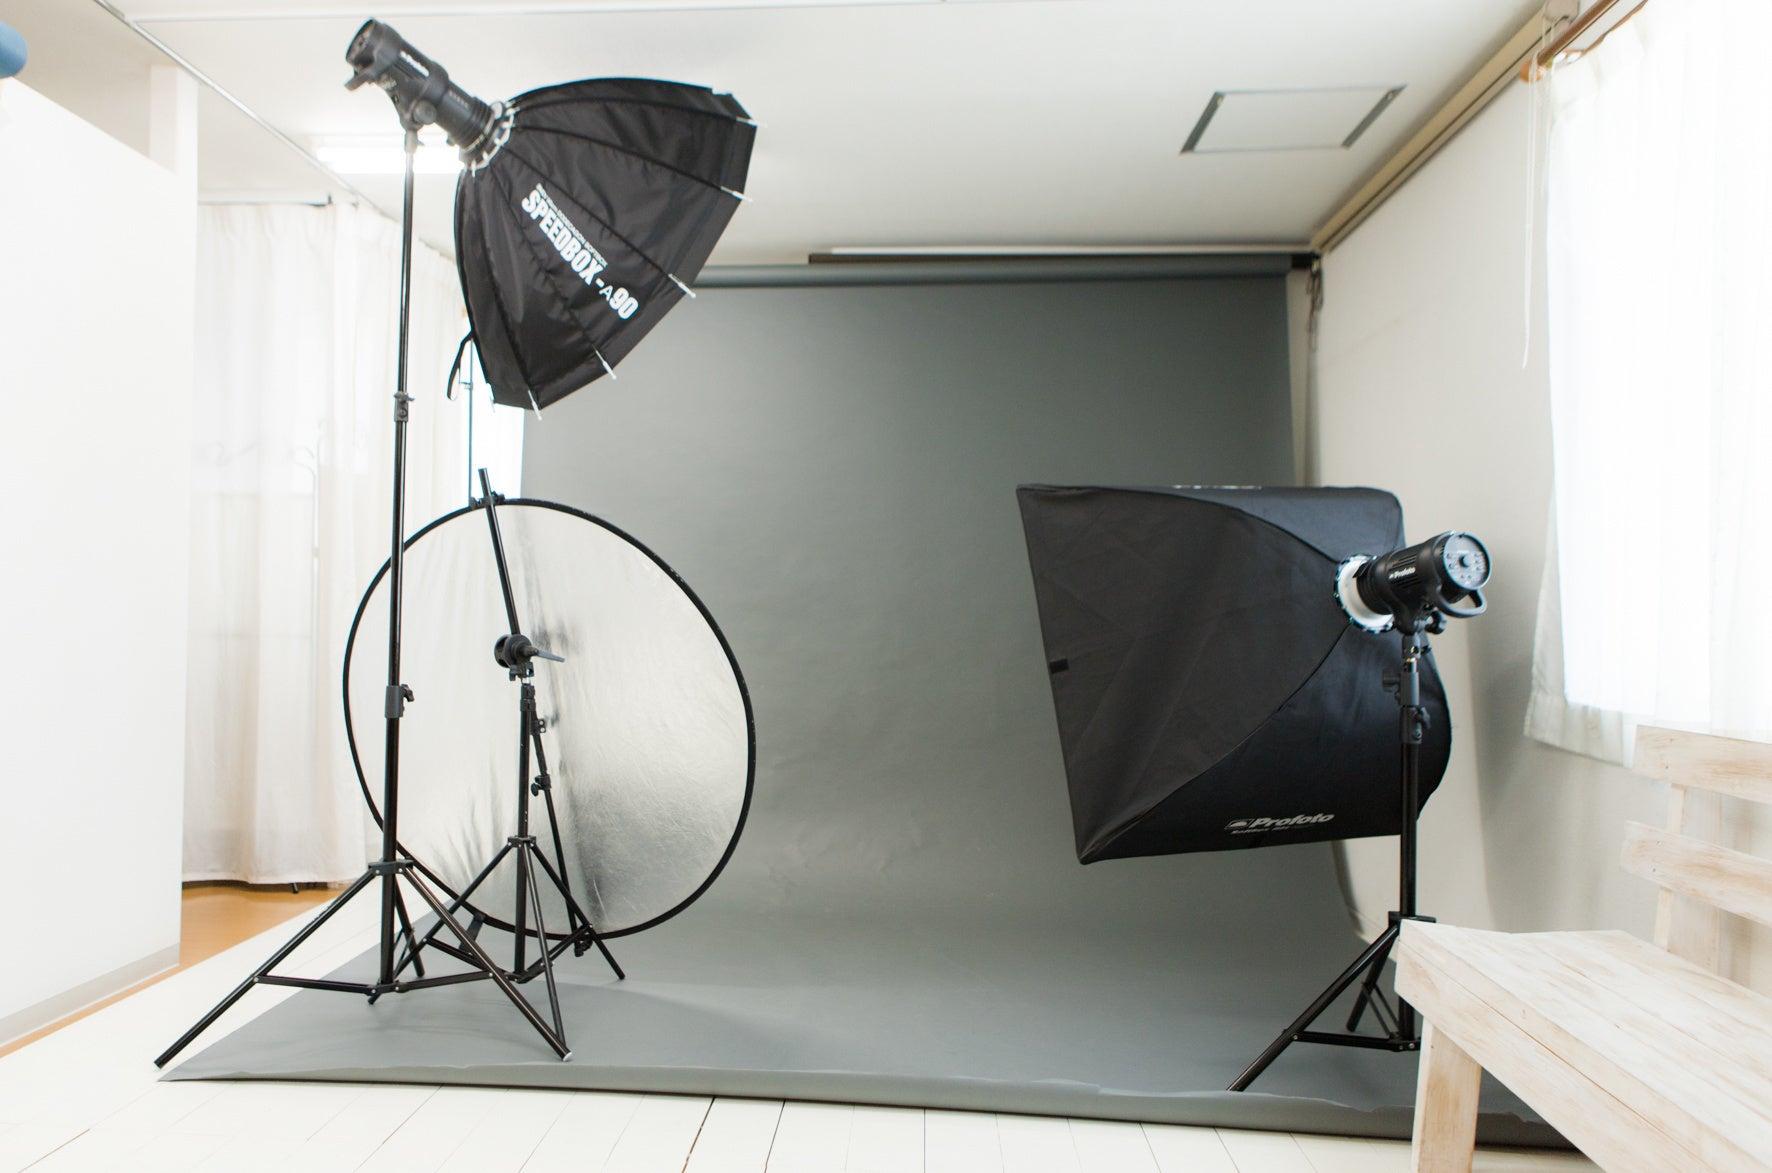 B<撮影設備の整ったフォトスタジオ>【地下鉄千代駅徒歩1分】撮影機材完備/メイク台/更衣室/完全個室/背景紙/博多区千代 の写真